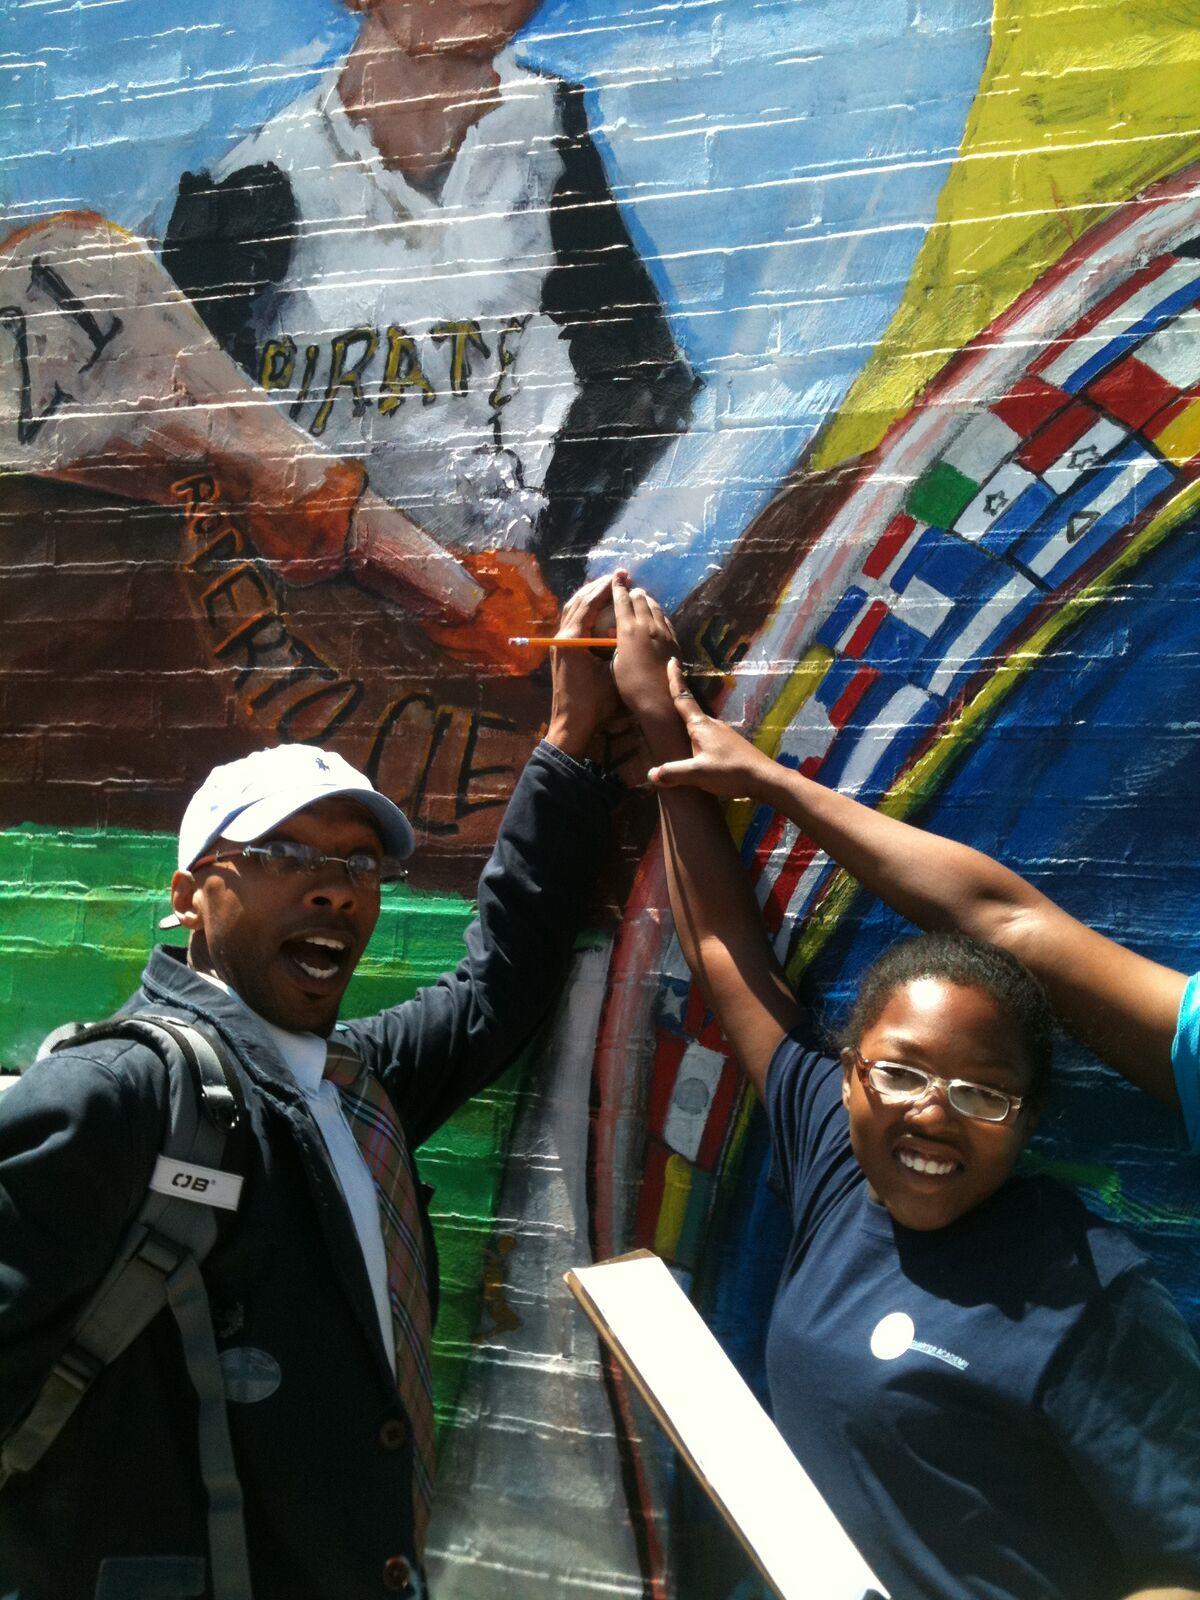 Humboldt Park Mural Arts Project